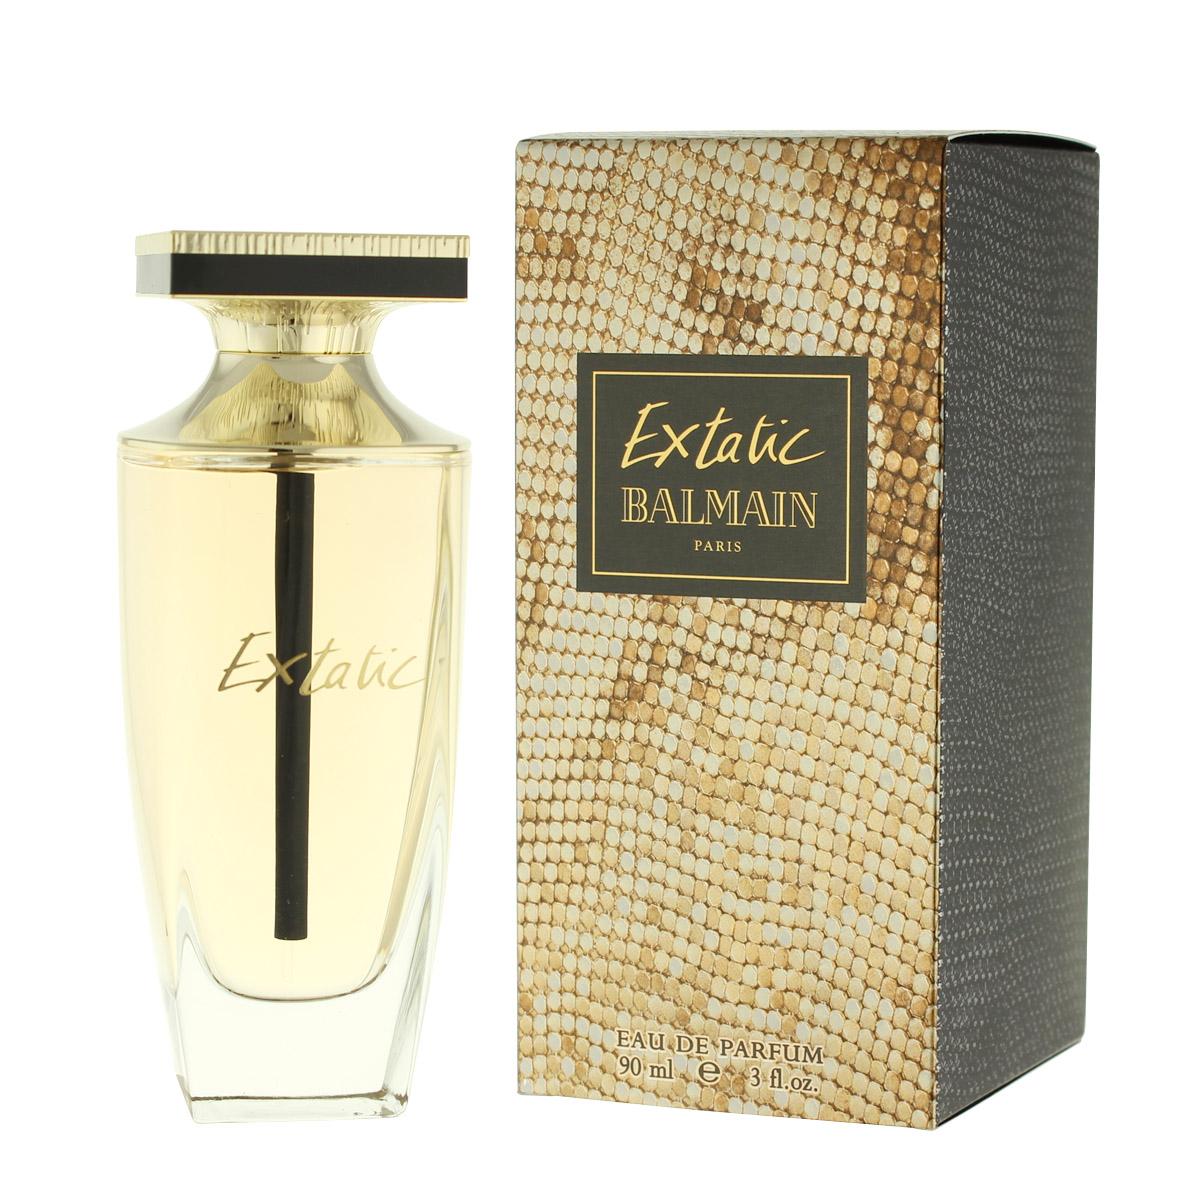 Balmain Extatic Eau De Parfum 90 ml (woman) 74237